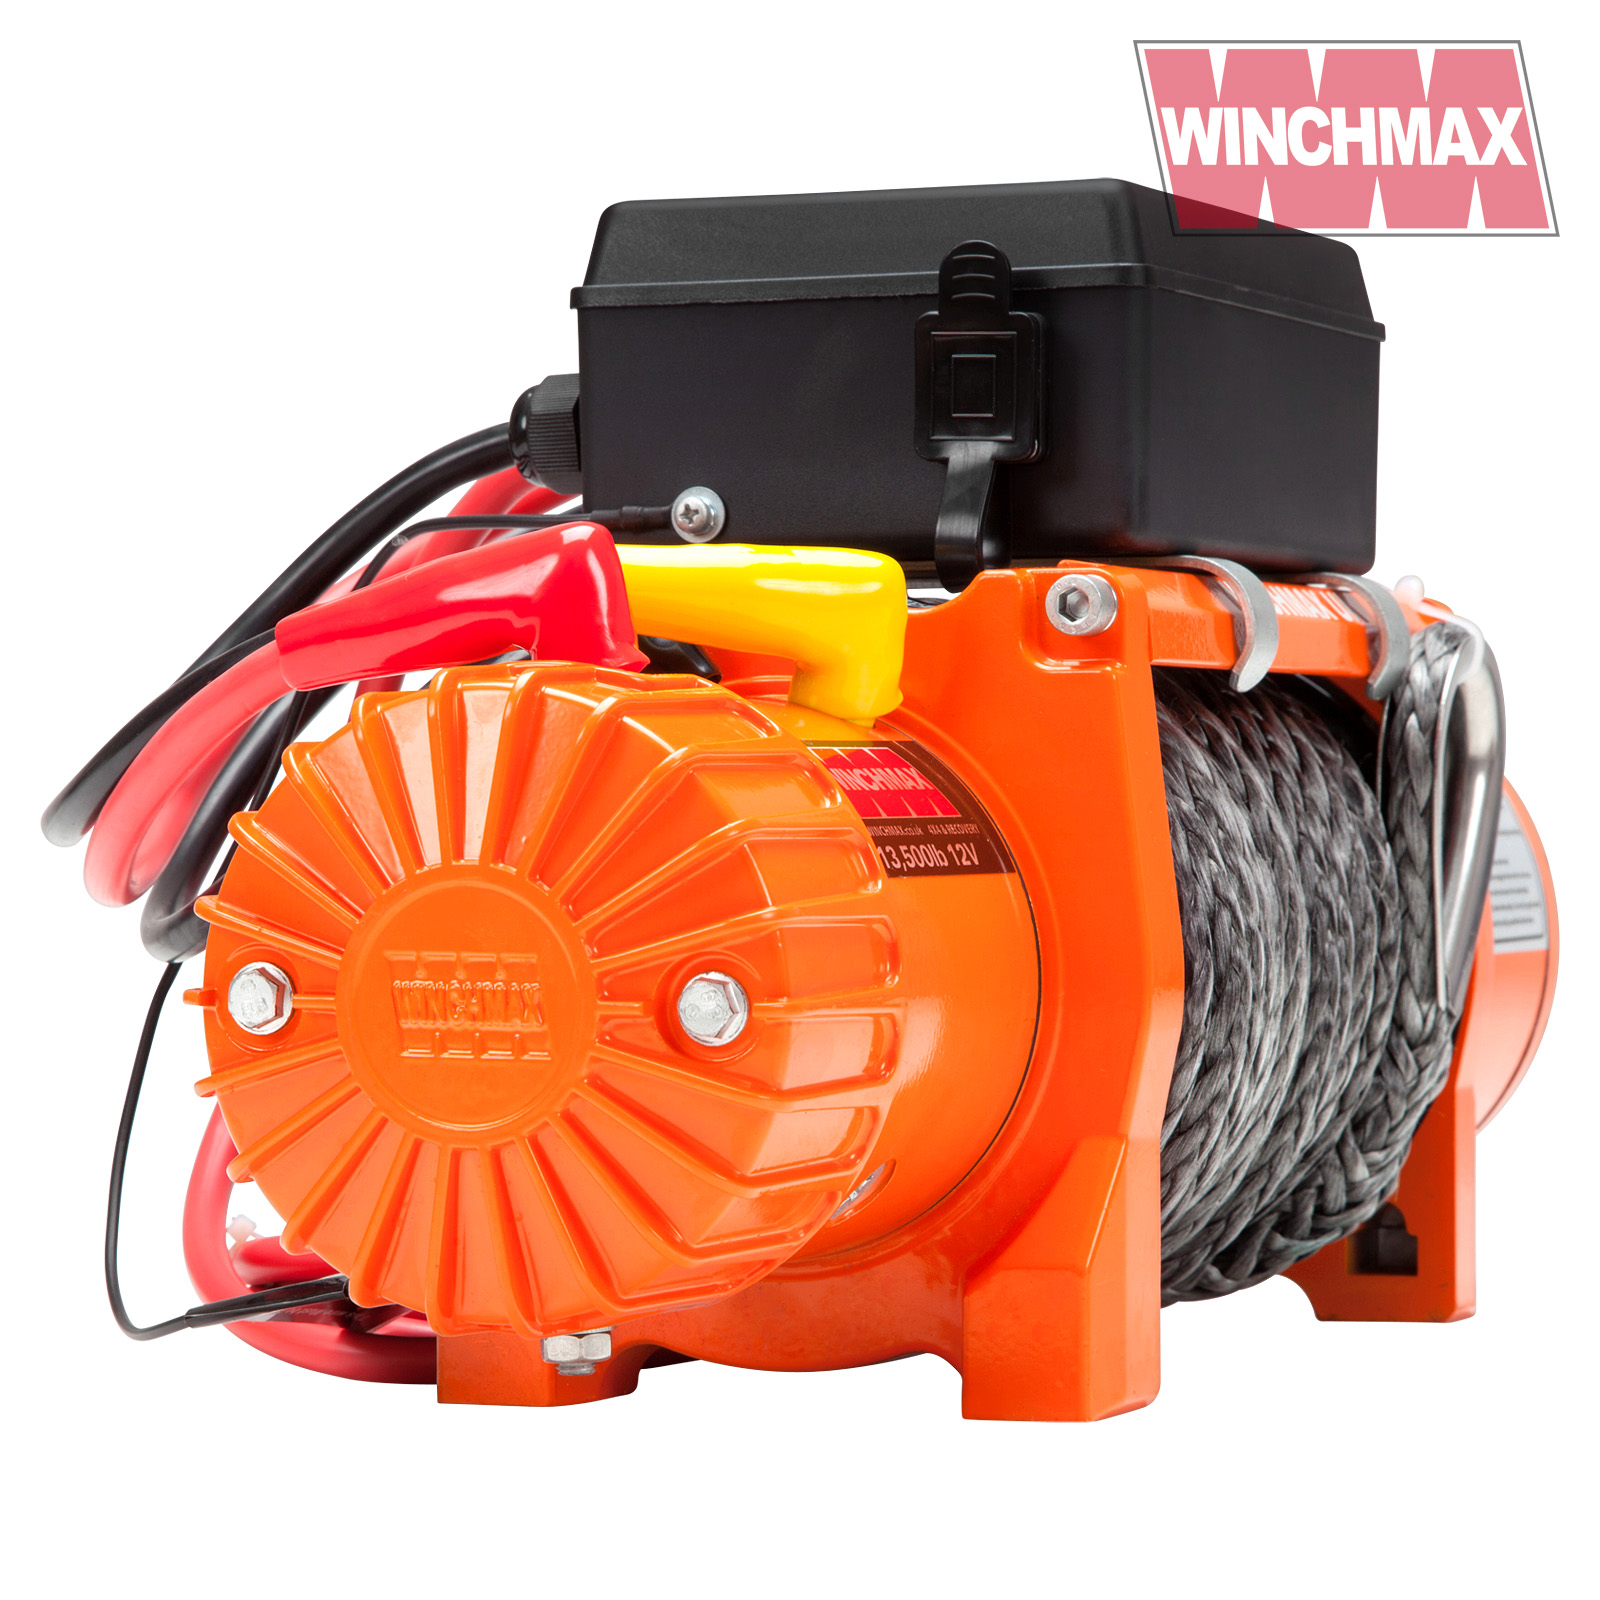 Wm1350012vsyn winchmax 511